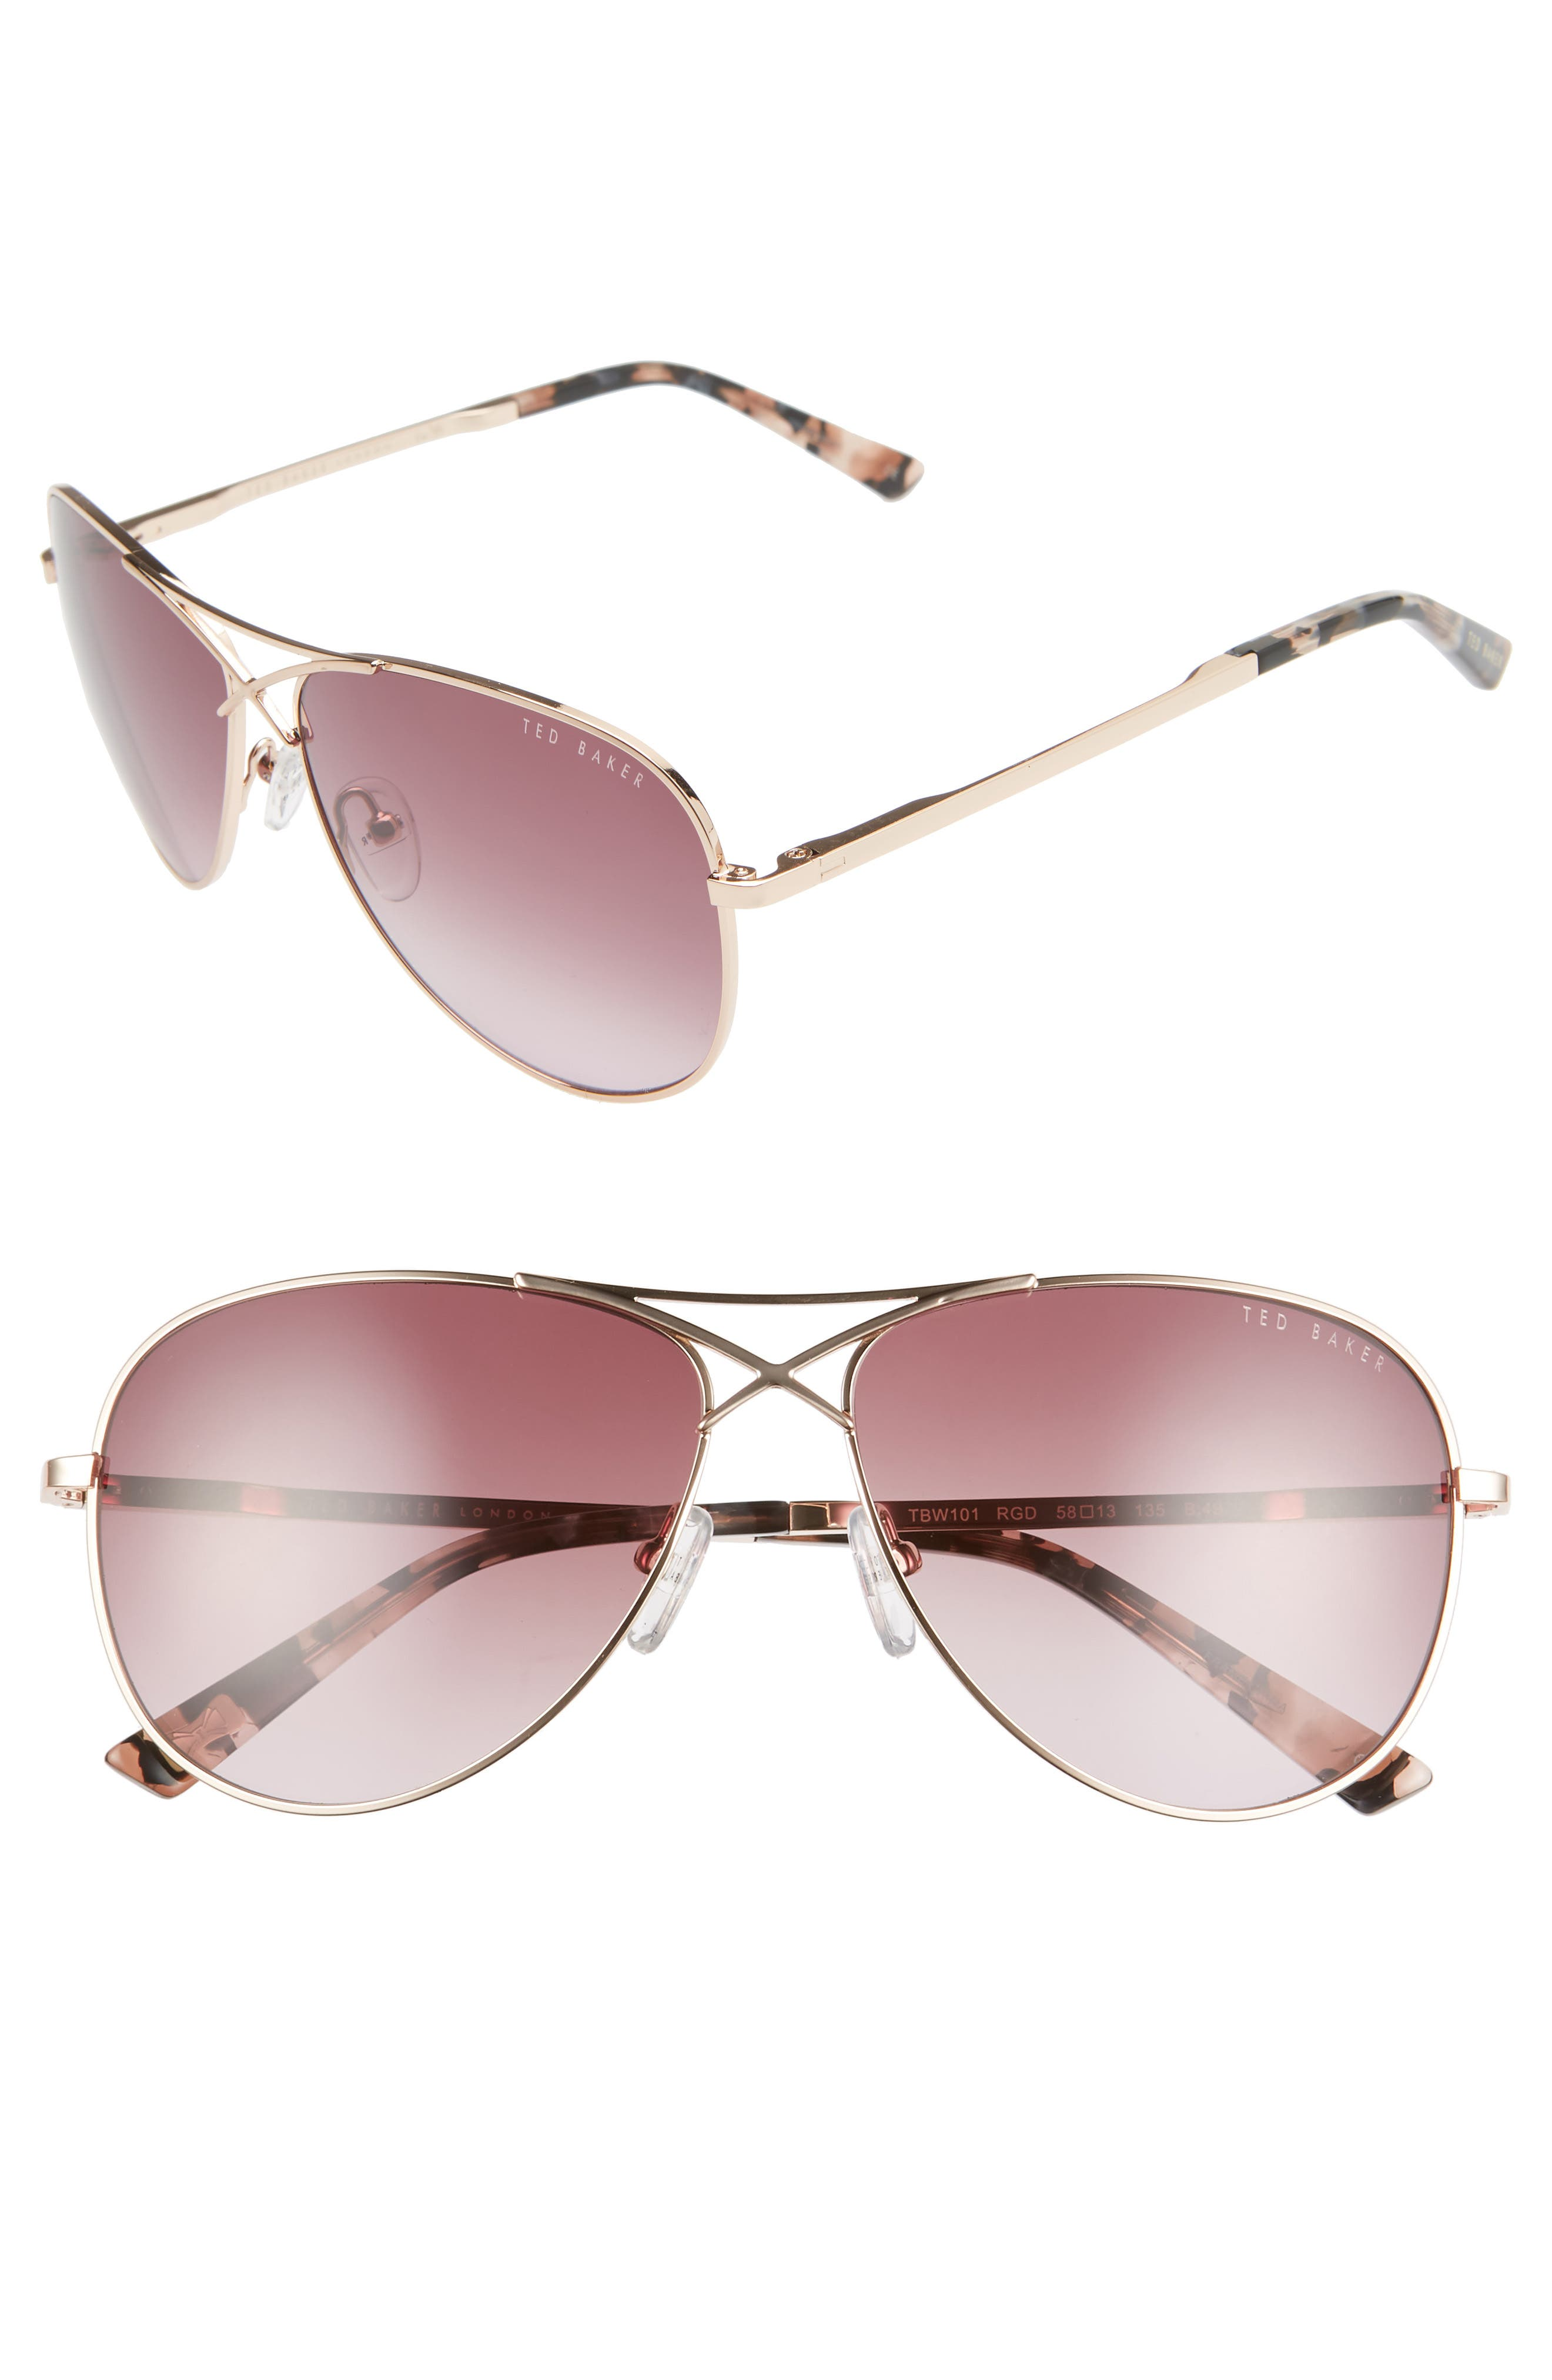 f6a95ac23e5a7 Ted Baker London Aviator Sunglasses